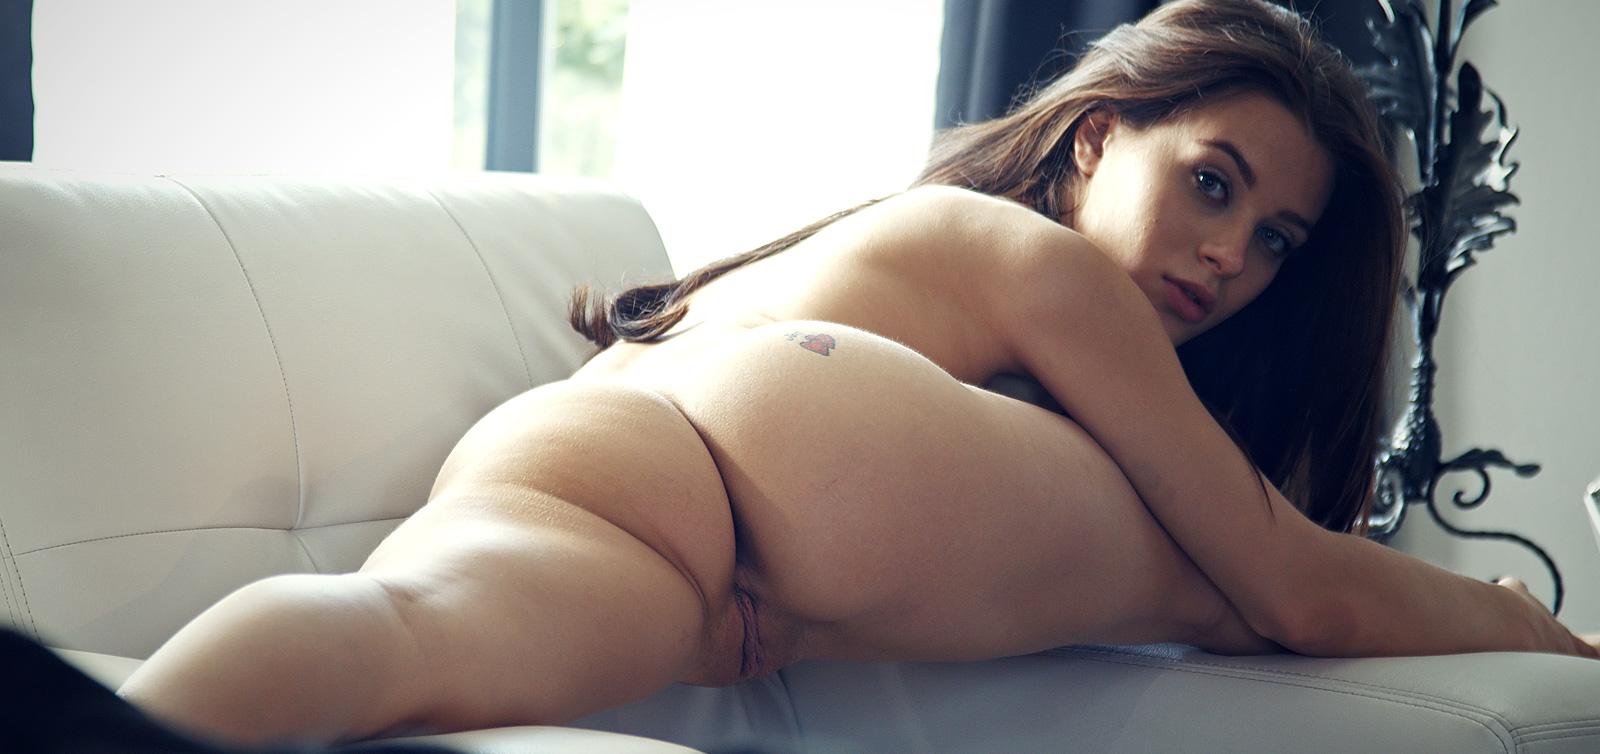 Lana rhoades pornfidelity